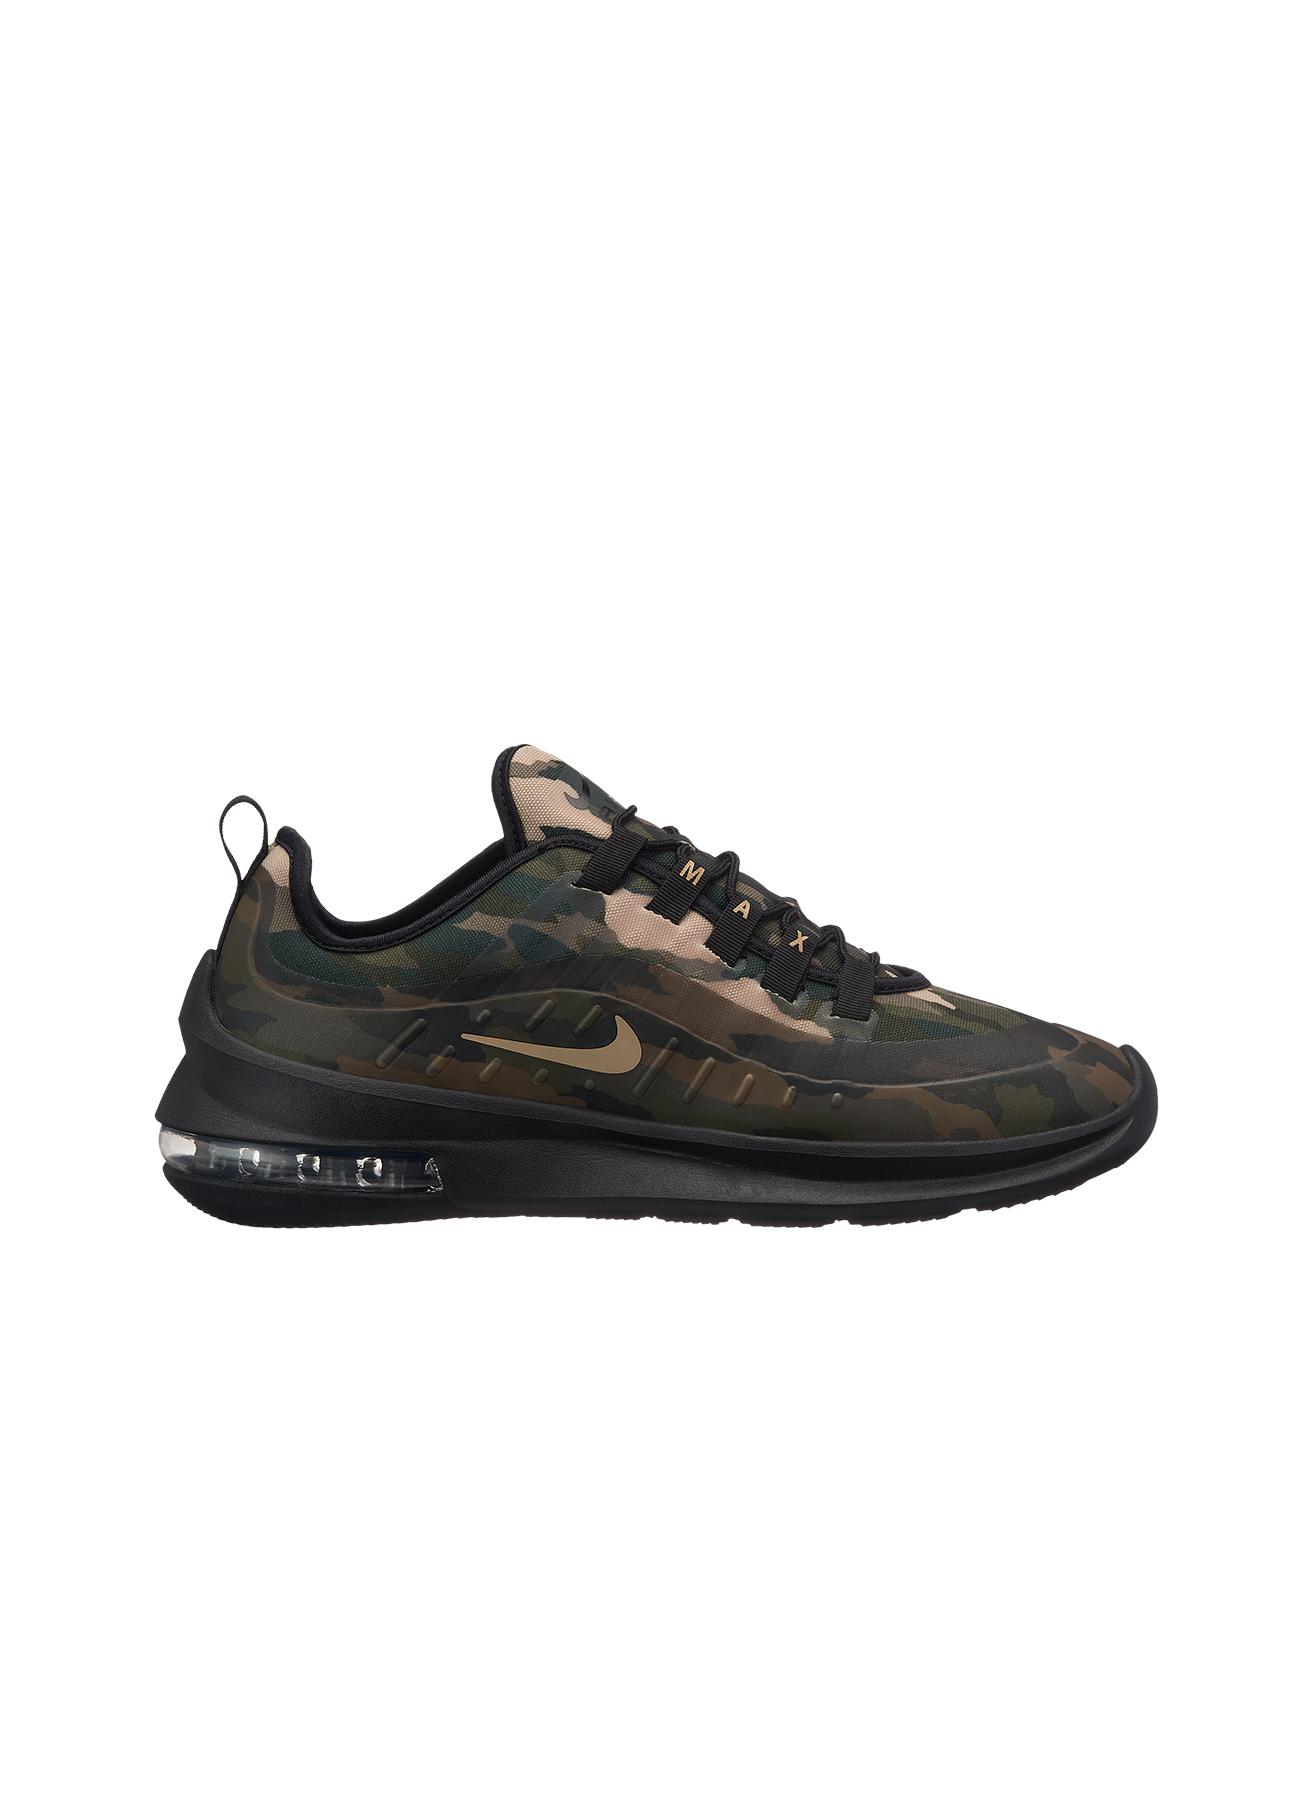 Nike Air Max Axis Premium Lifestyle Ayakkabı 46 5001635191009 Ürün Resmi